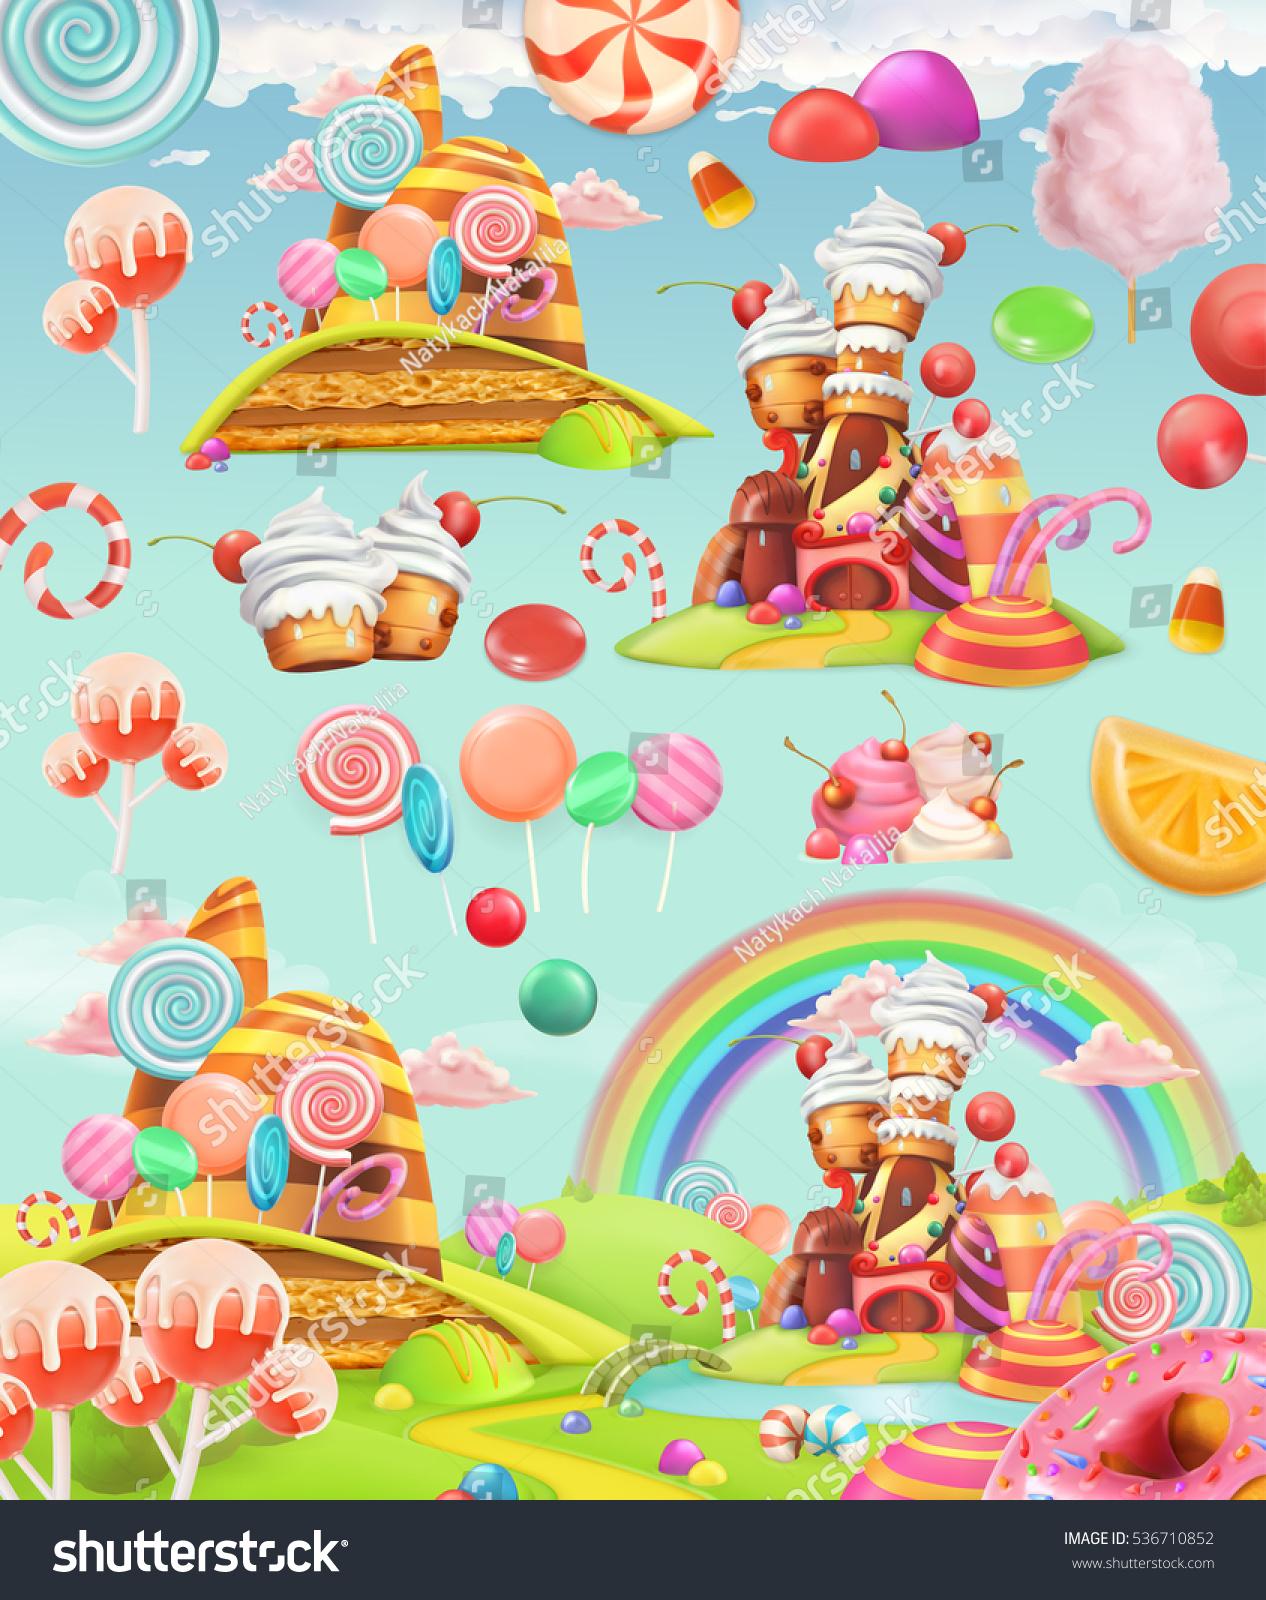 Sweet Candy Land Cartoon Game Background Vector de stock536710852 ...